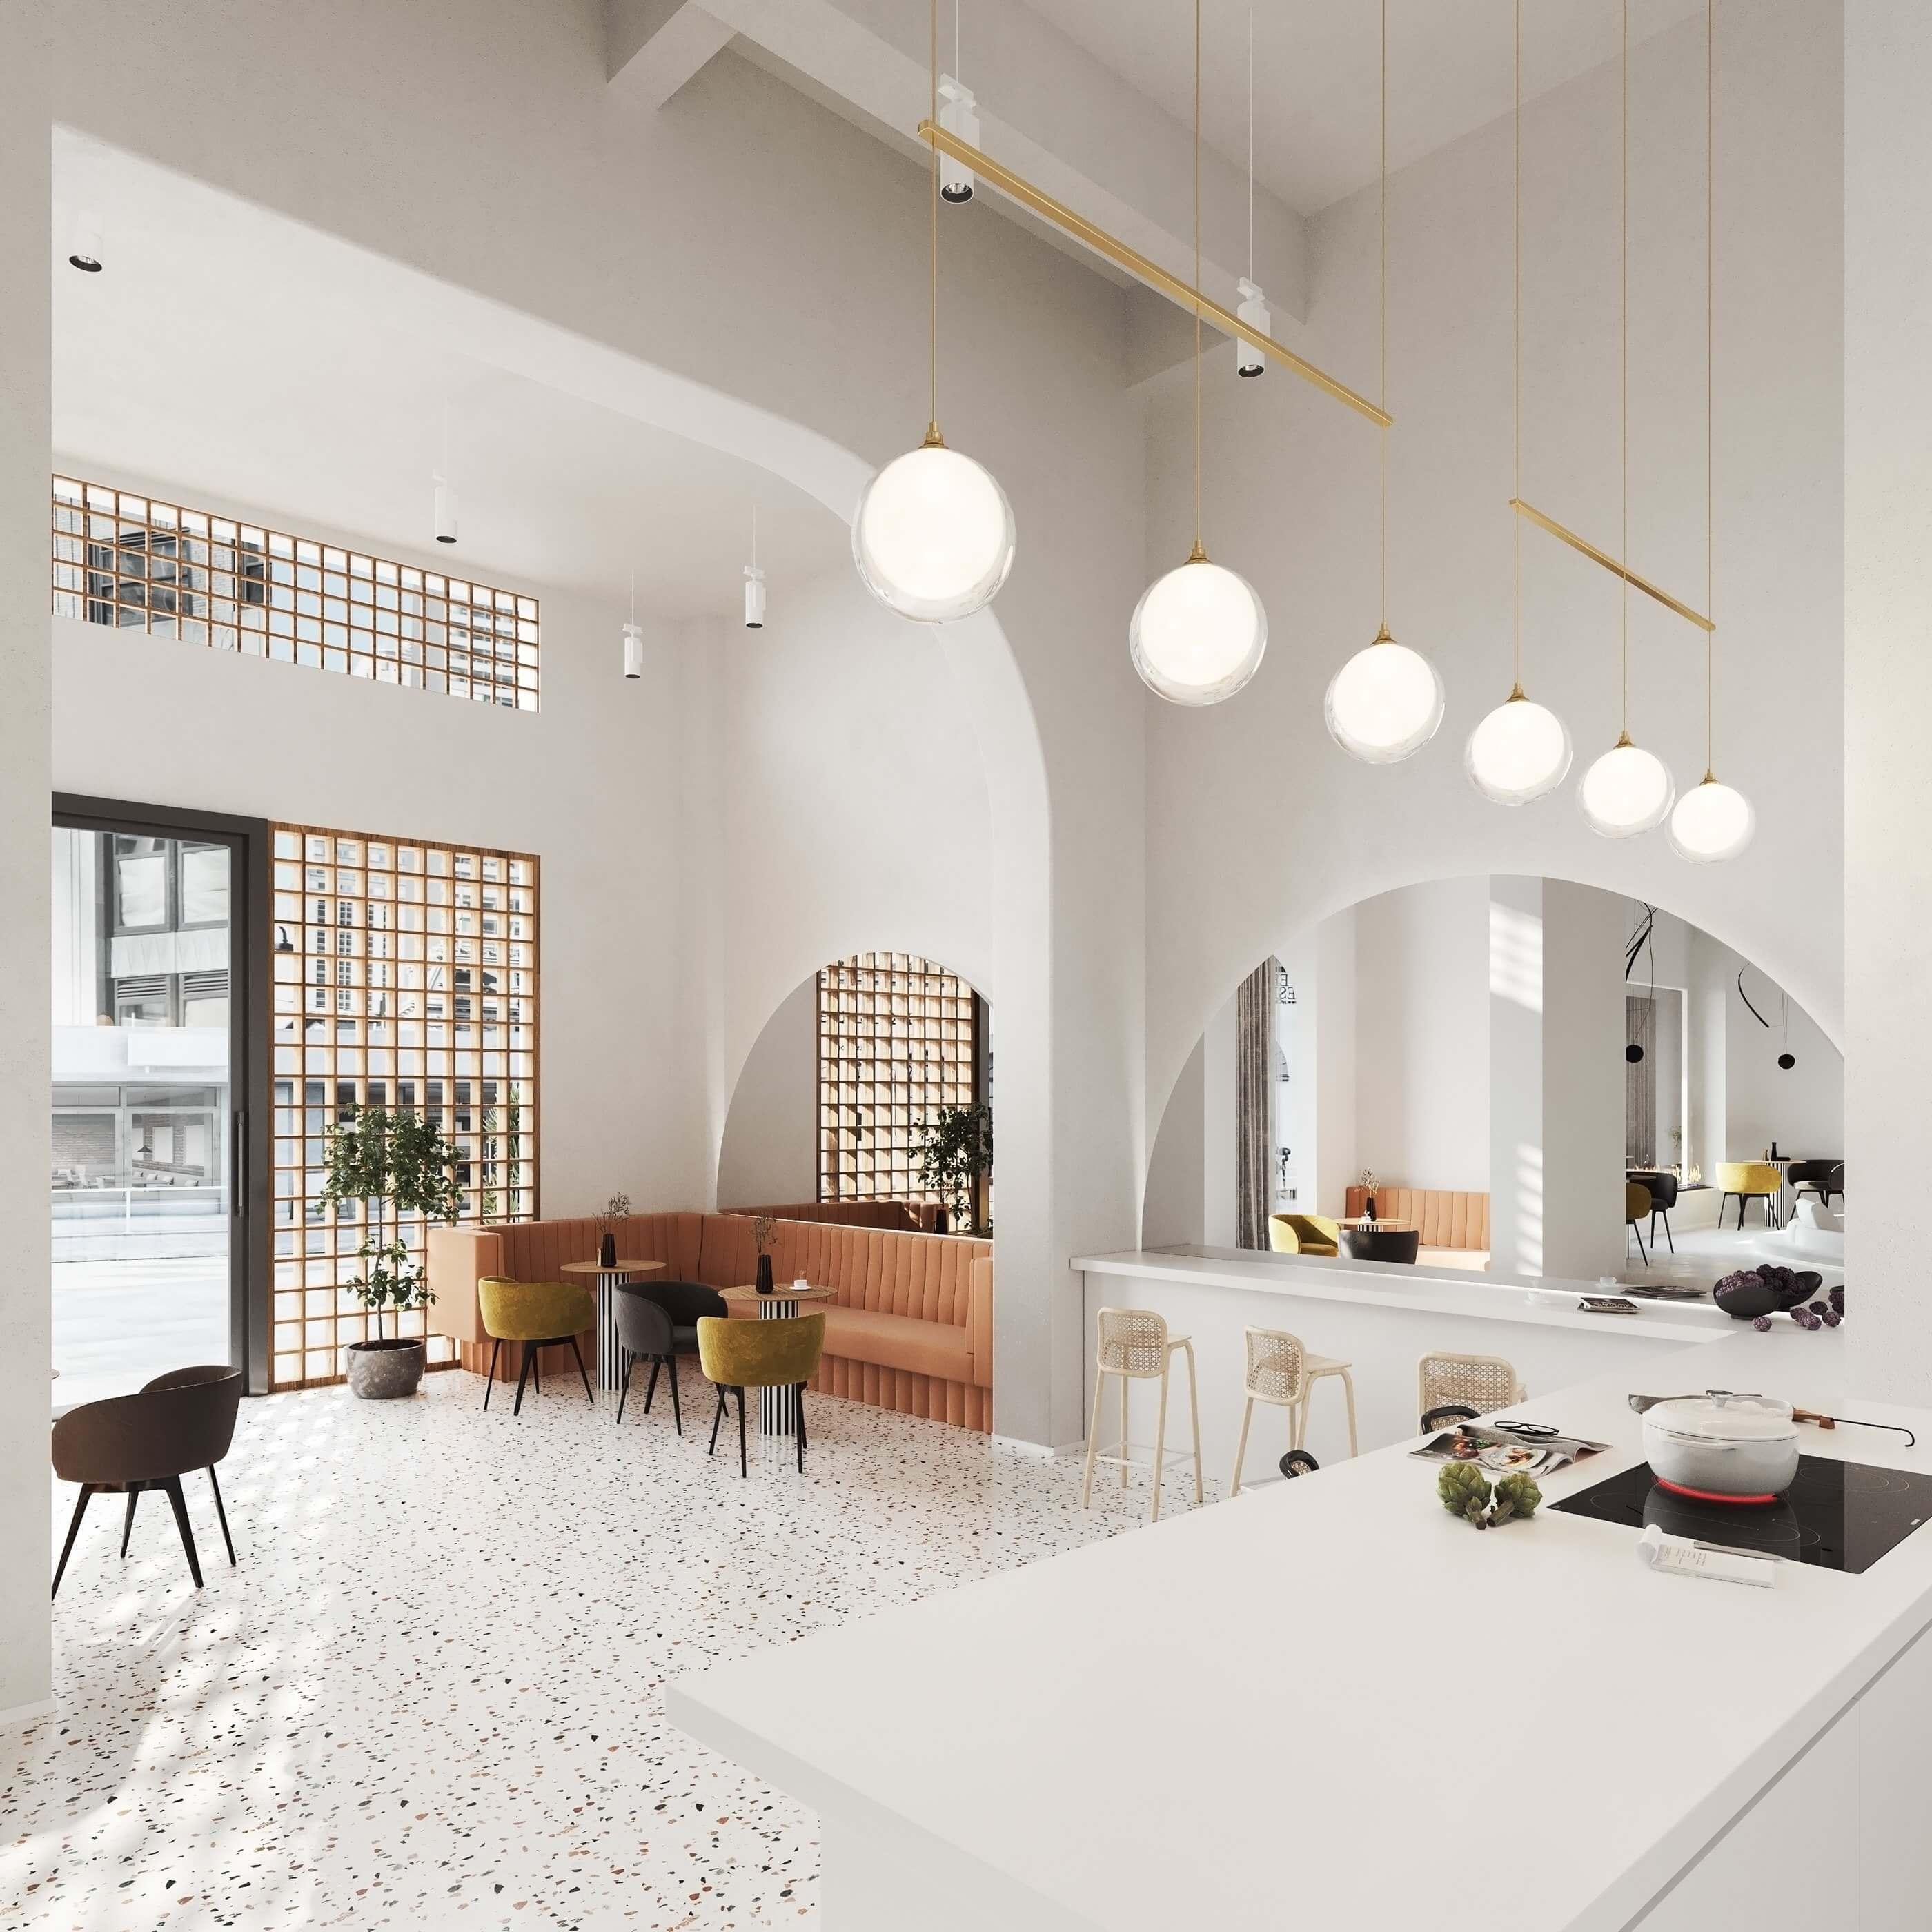 Modern bar restaurant design space - cgi visualization